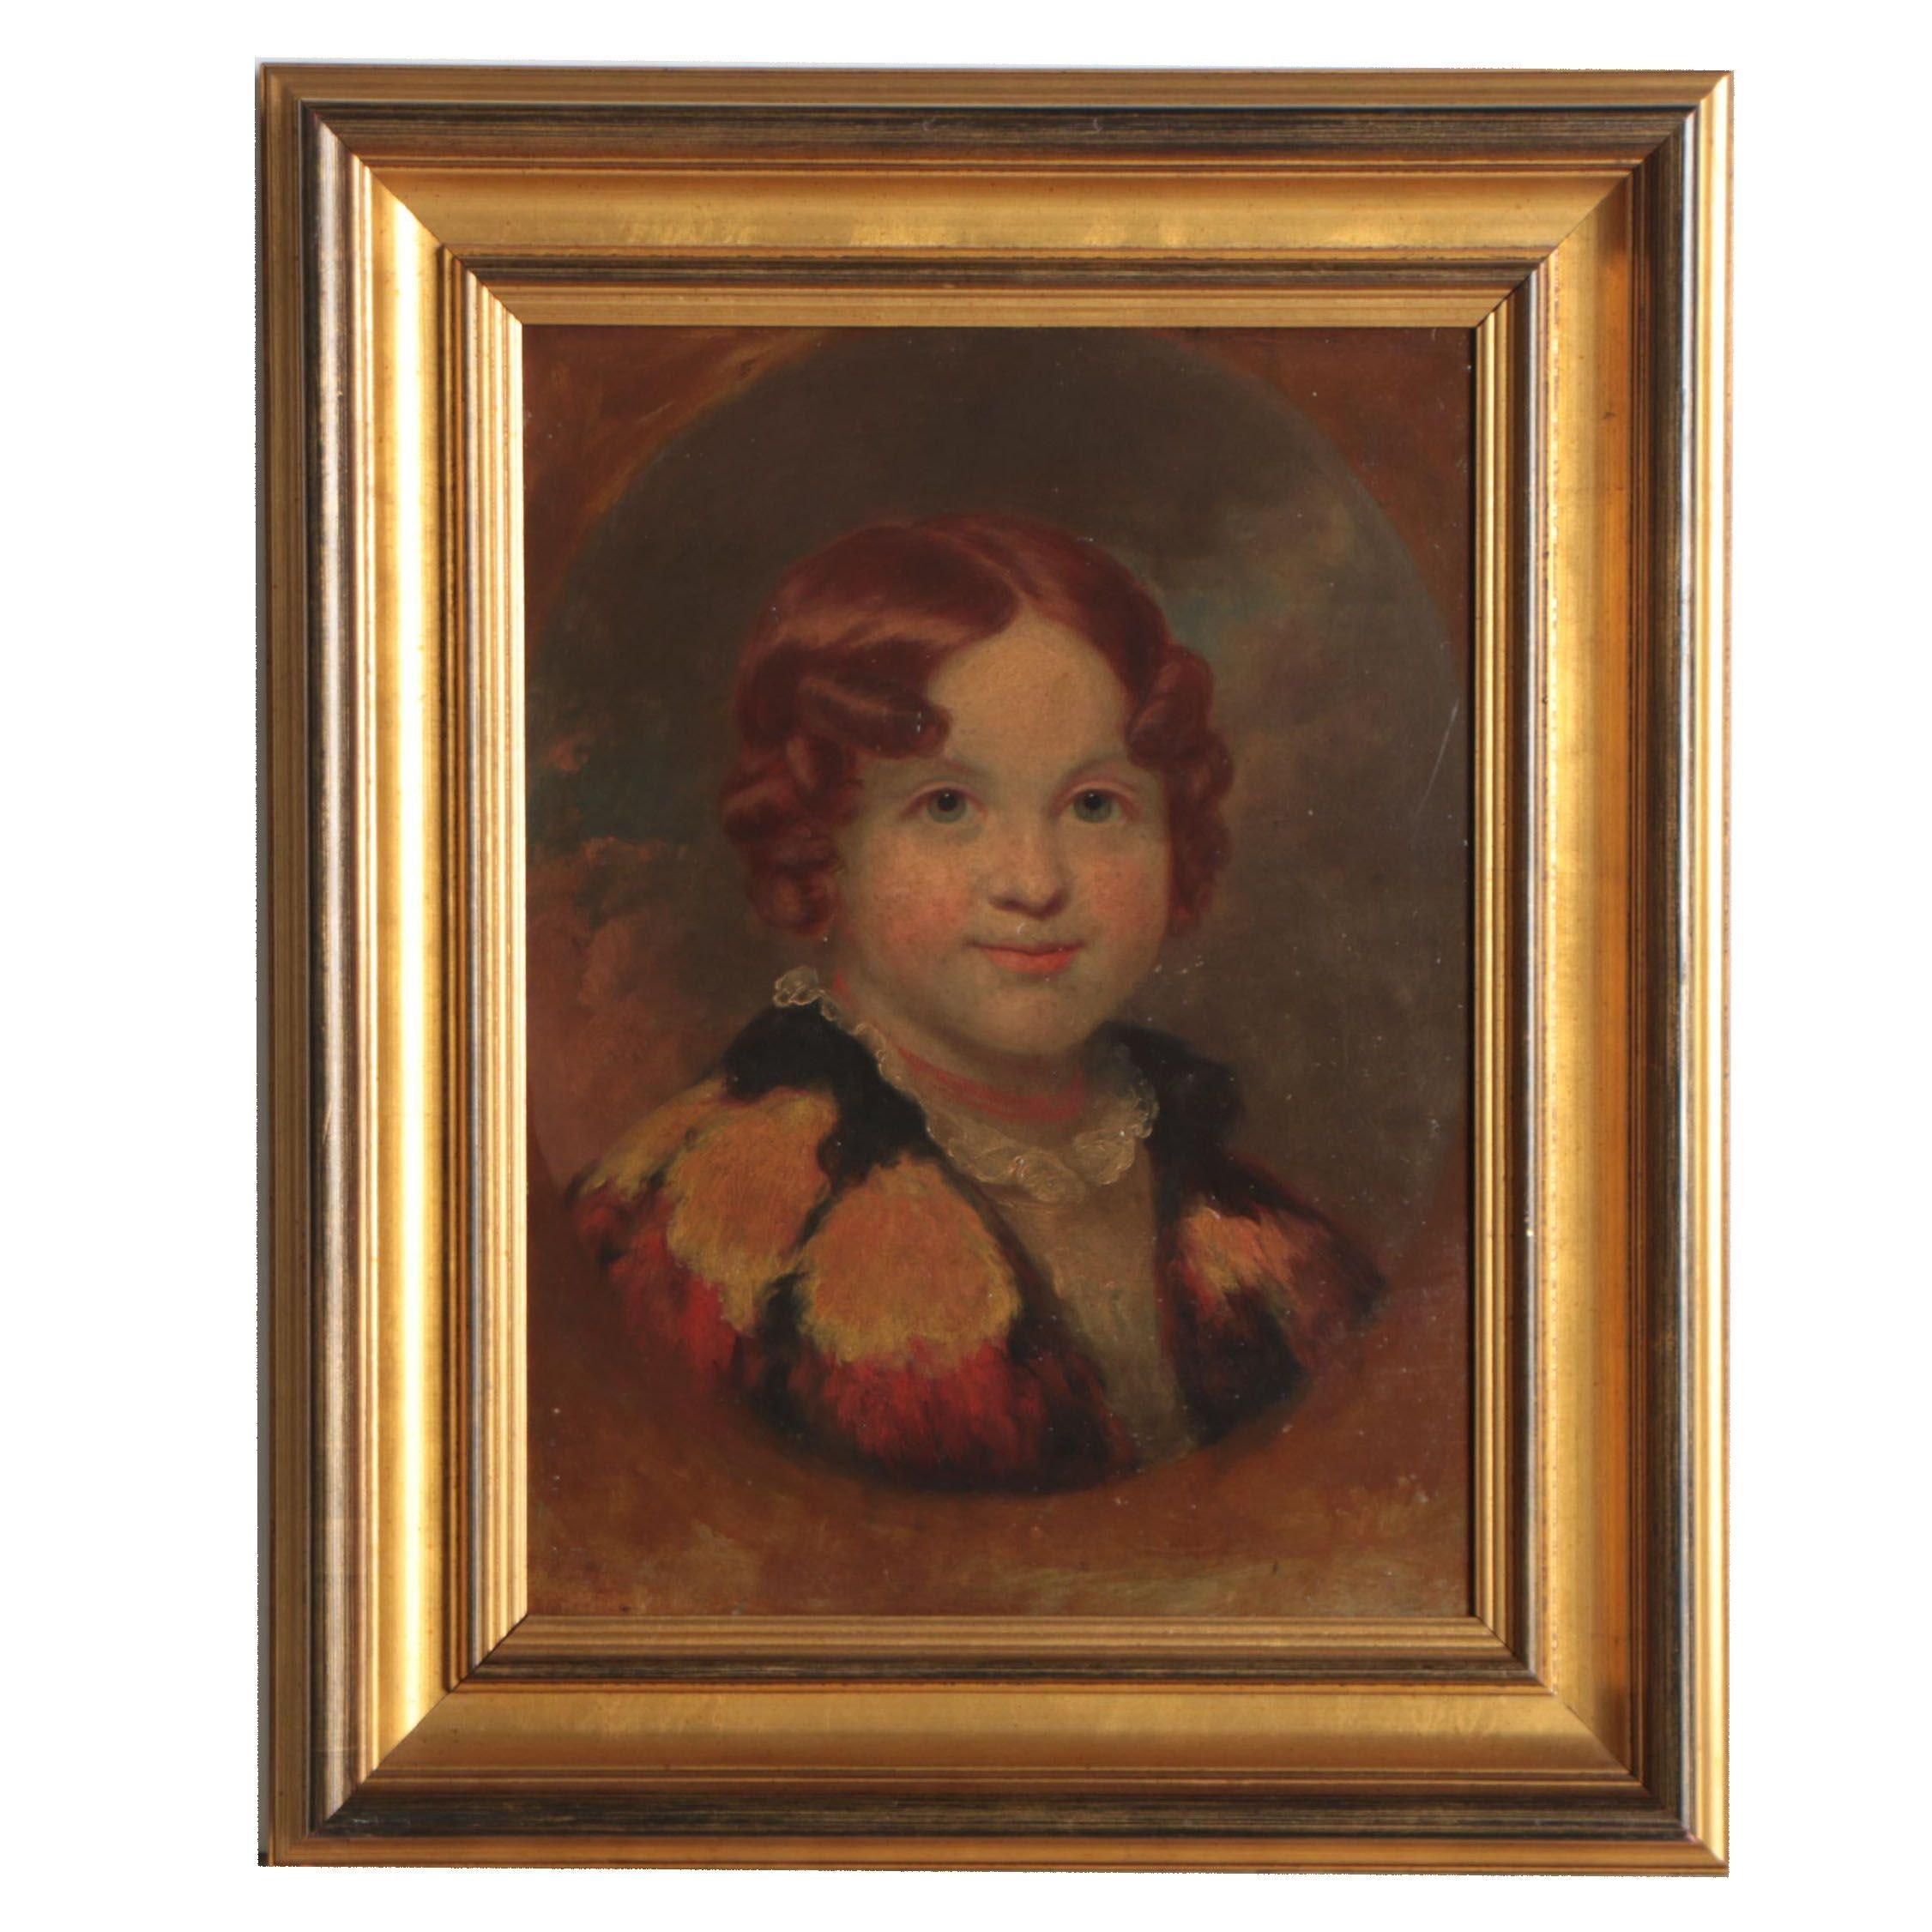 19th Century Oil Portrait of Child